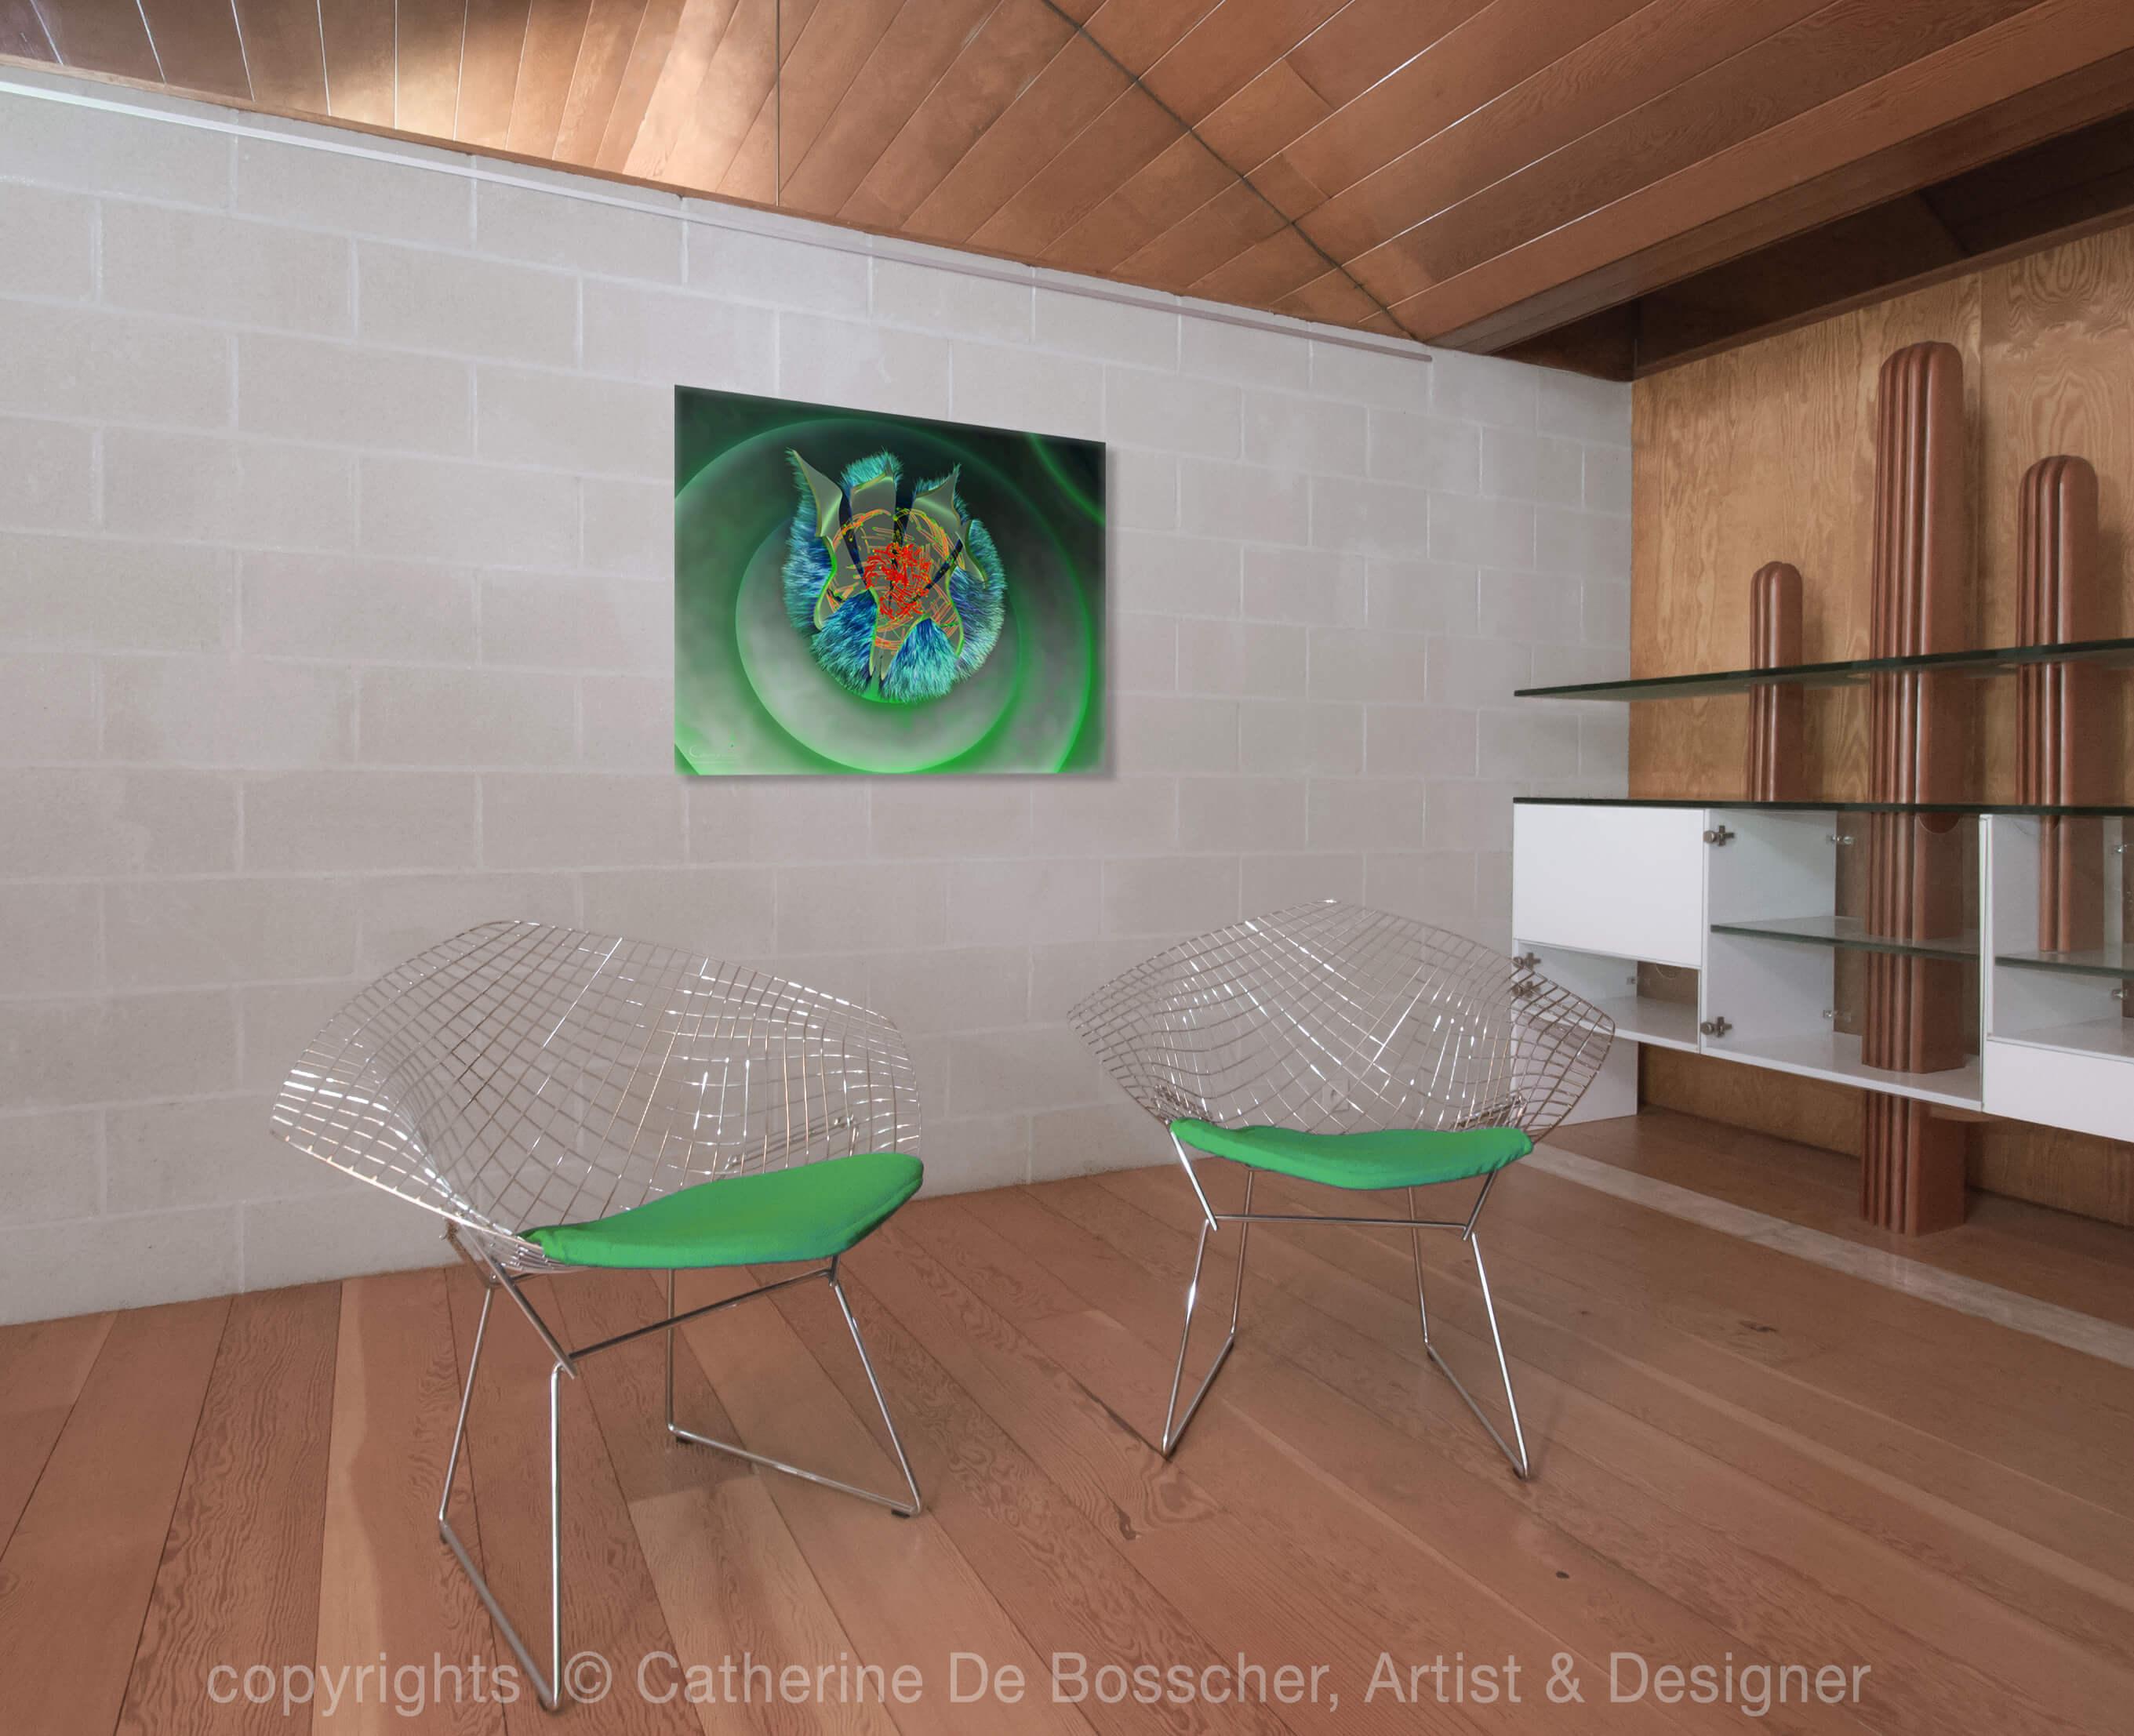 GREEN CAPSULE 3 Artwork 100 x 80 cm by Catherine De Bosscher